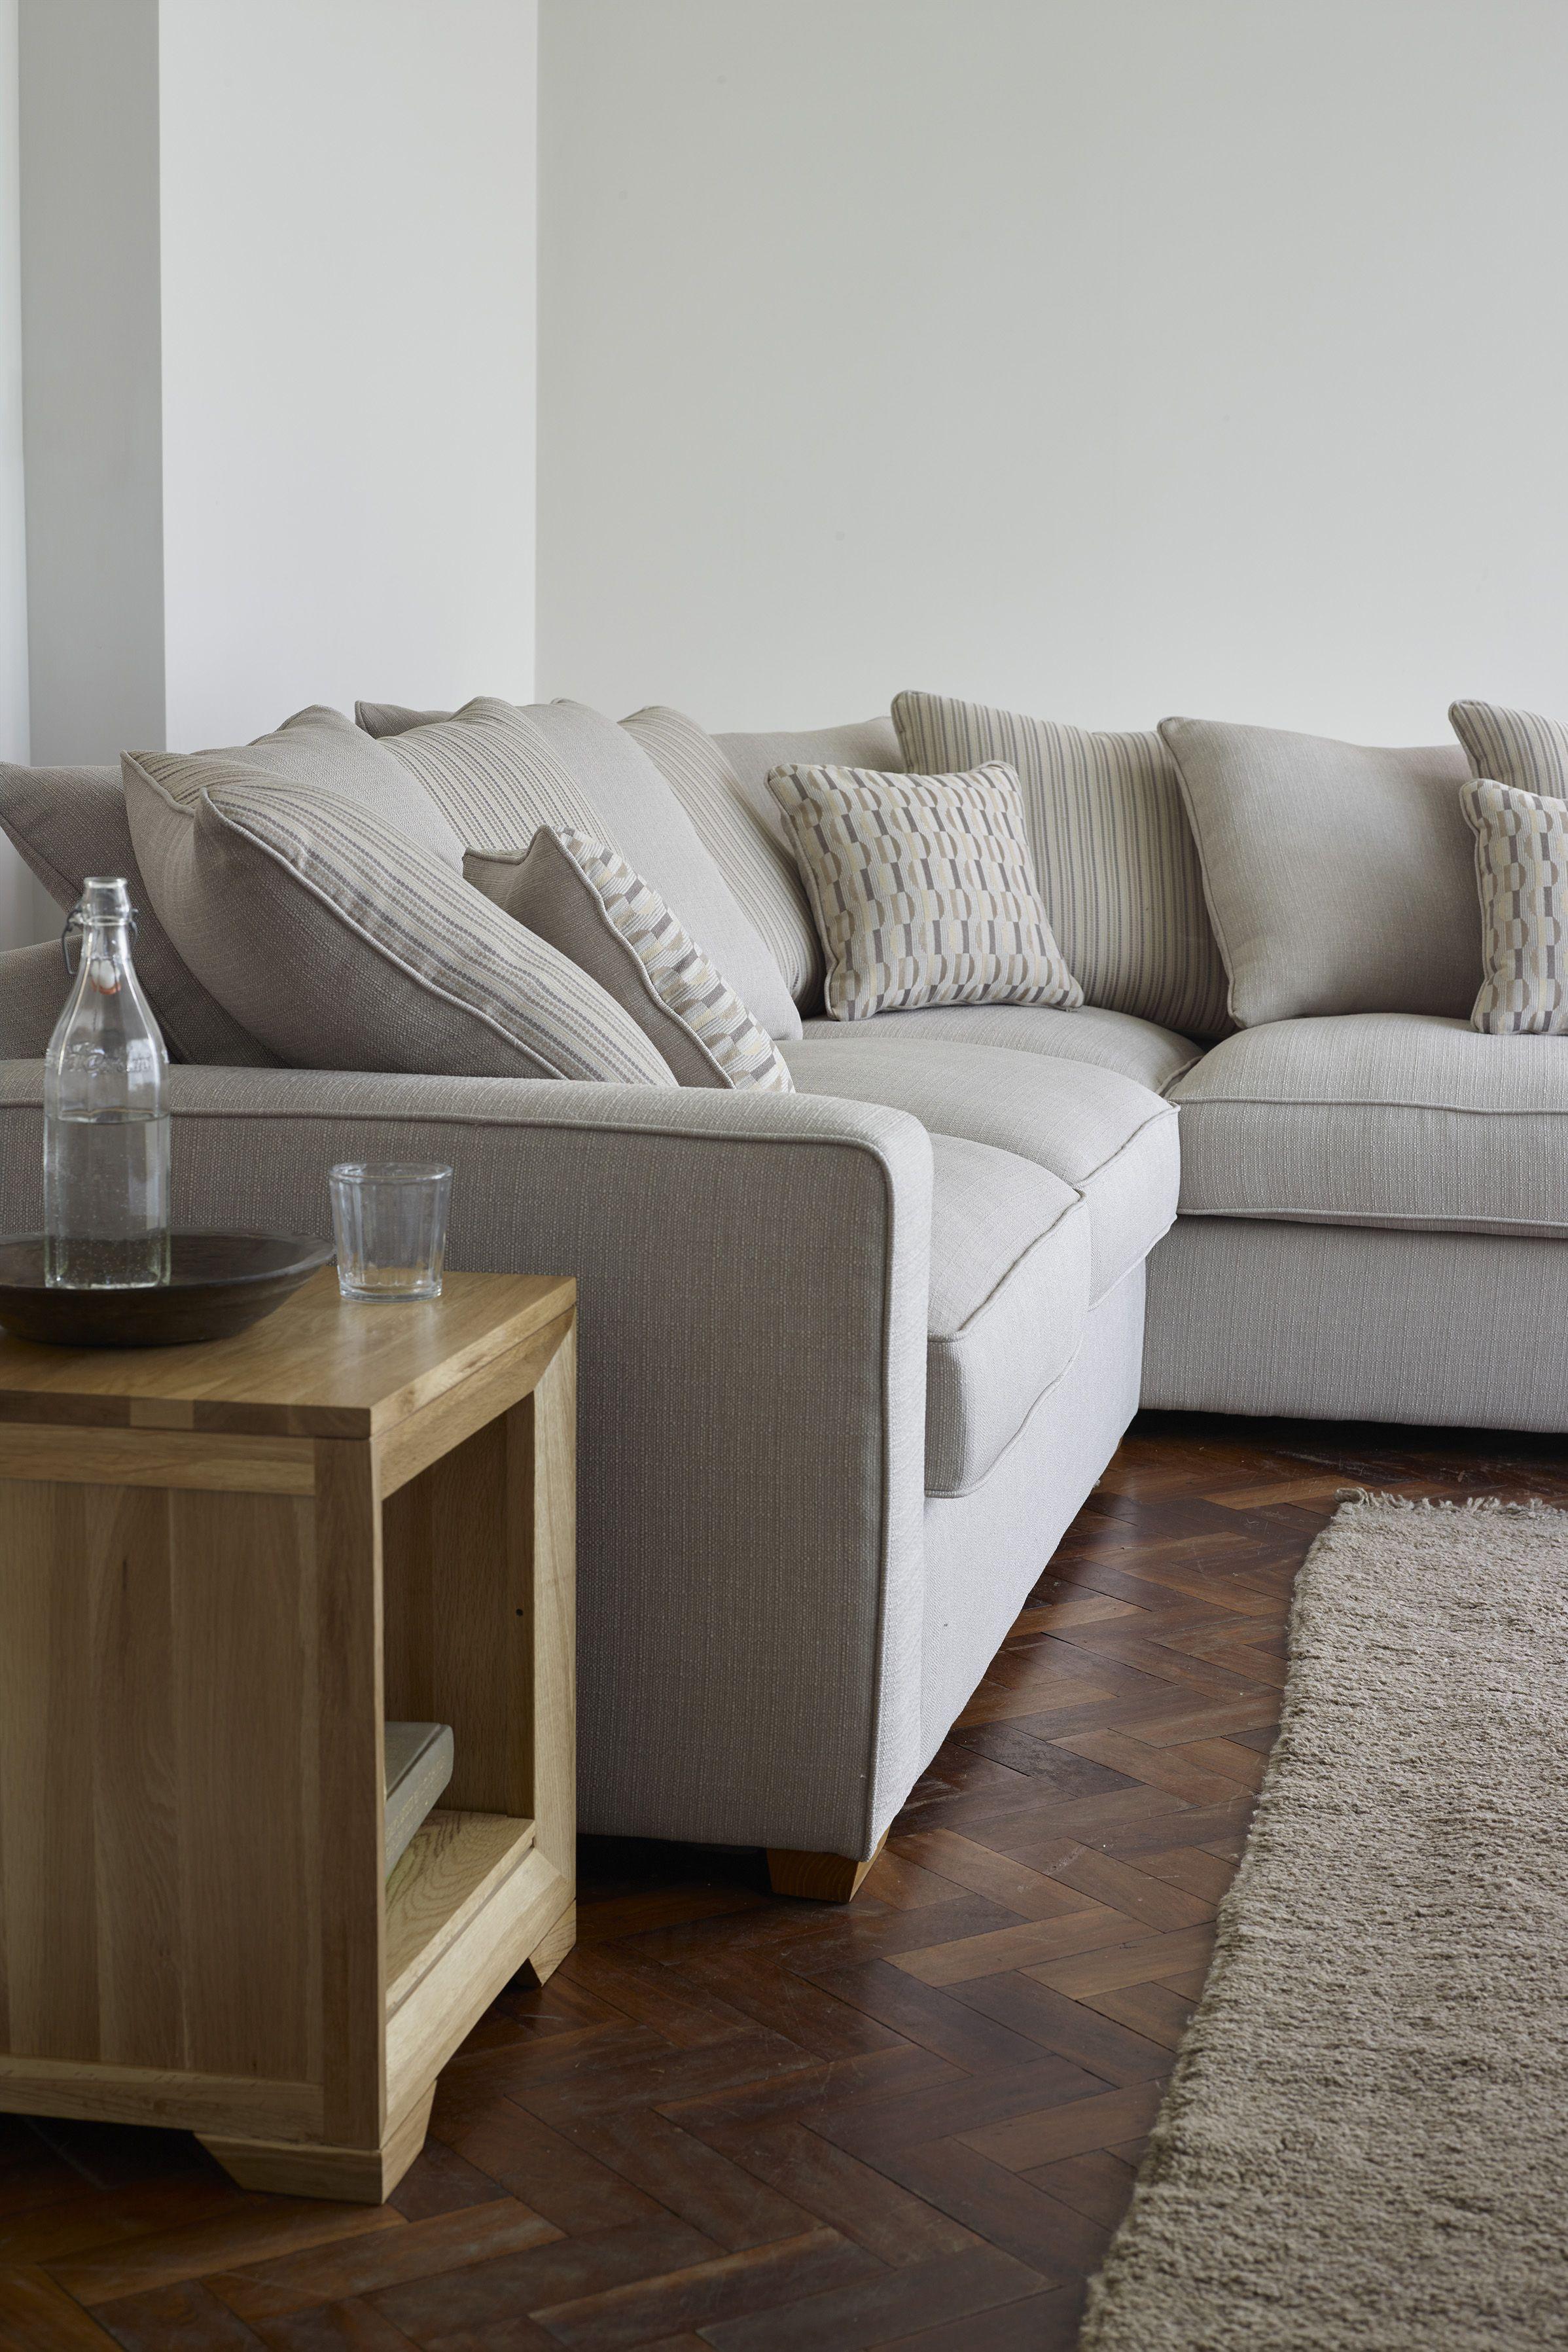 Nebraska Pillow Back Left Corner Sofa In Aero Fawn With Duck Egg Fabric Storage Footstool Corner Sofa Design Corner Sofa Uk Living Room Corner